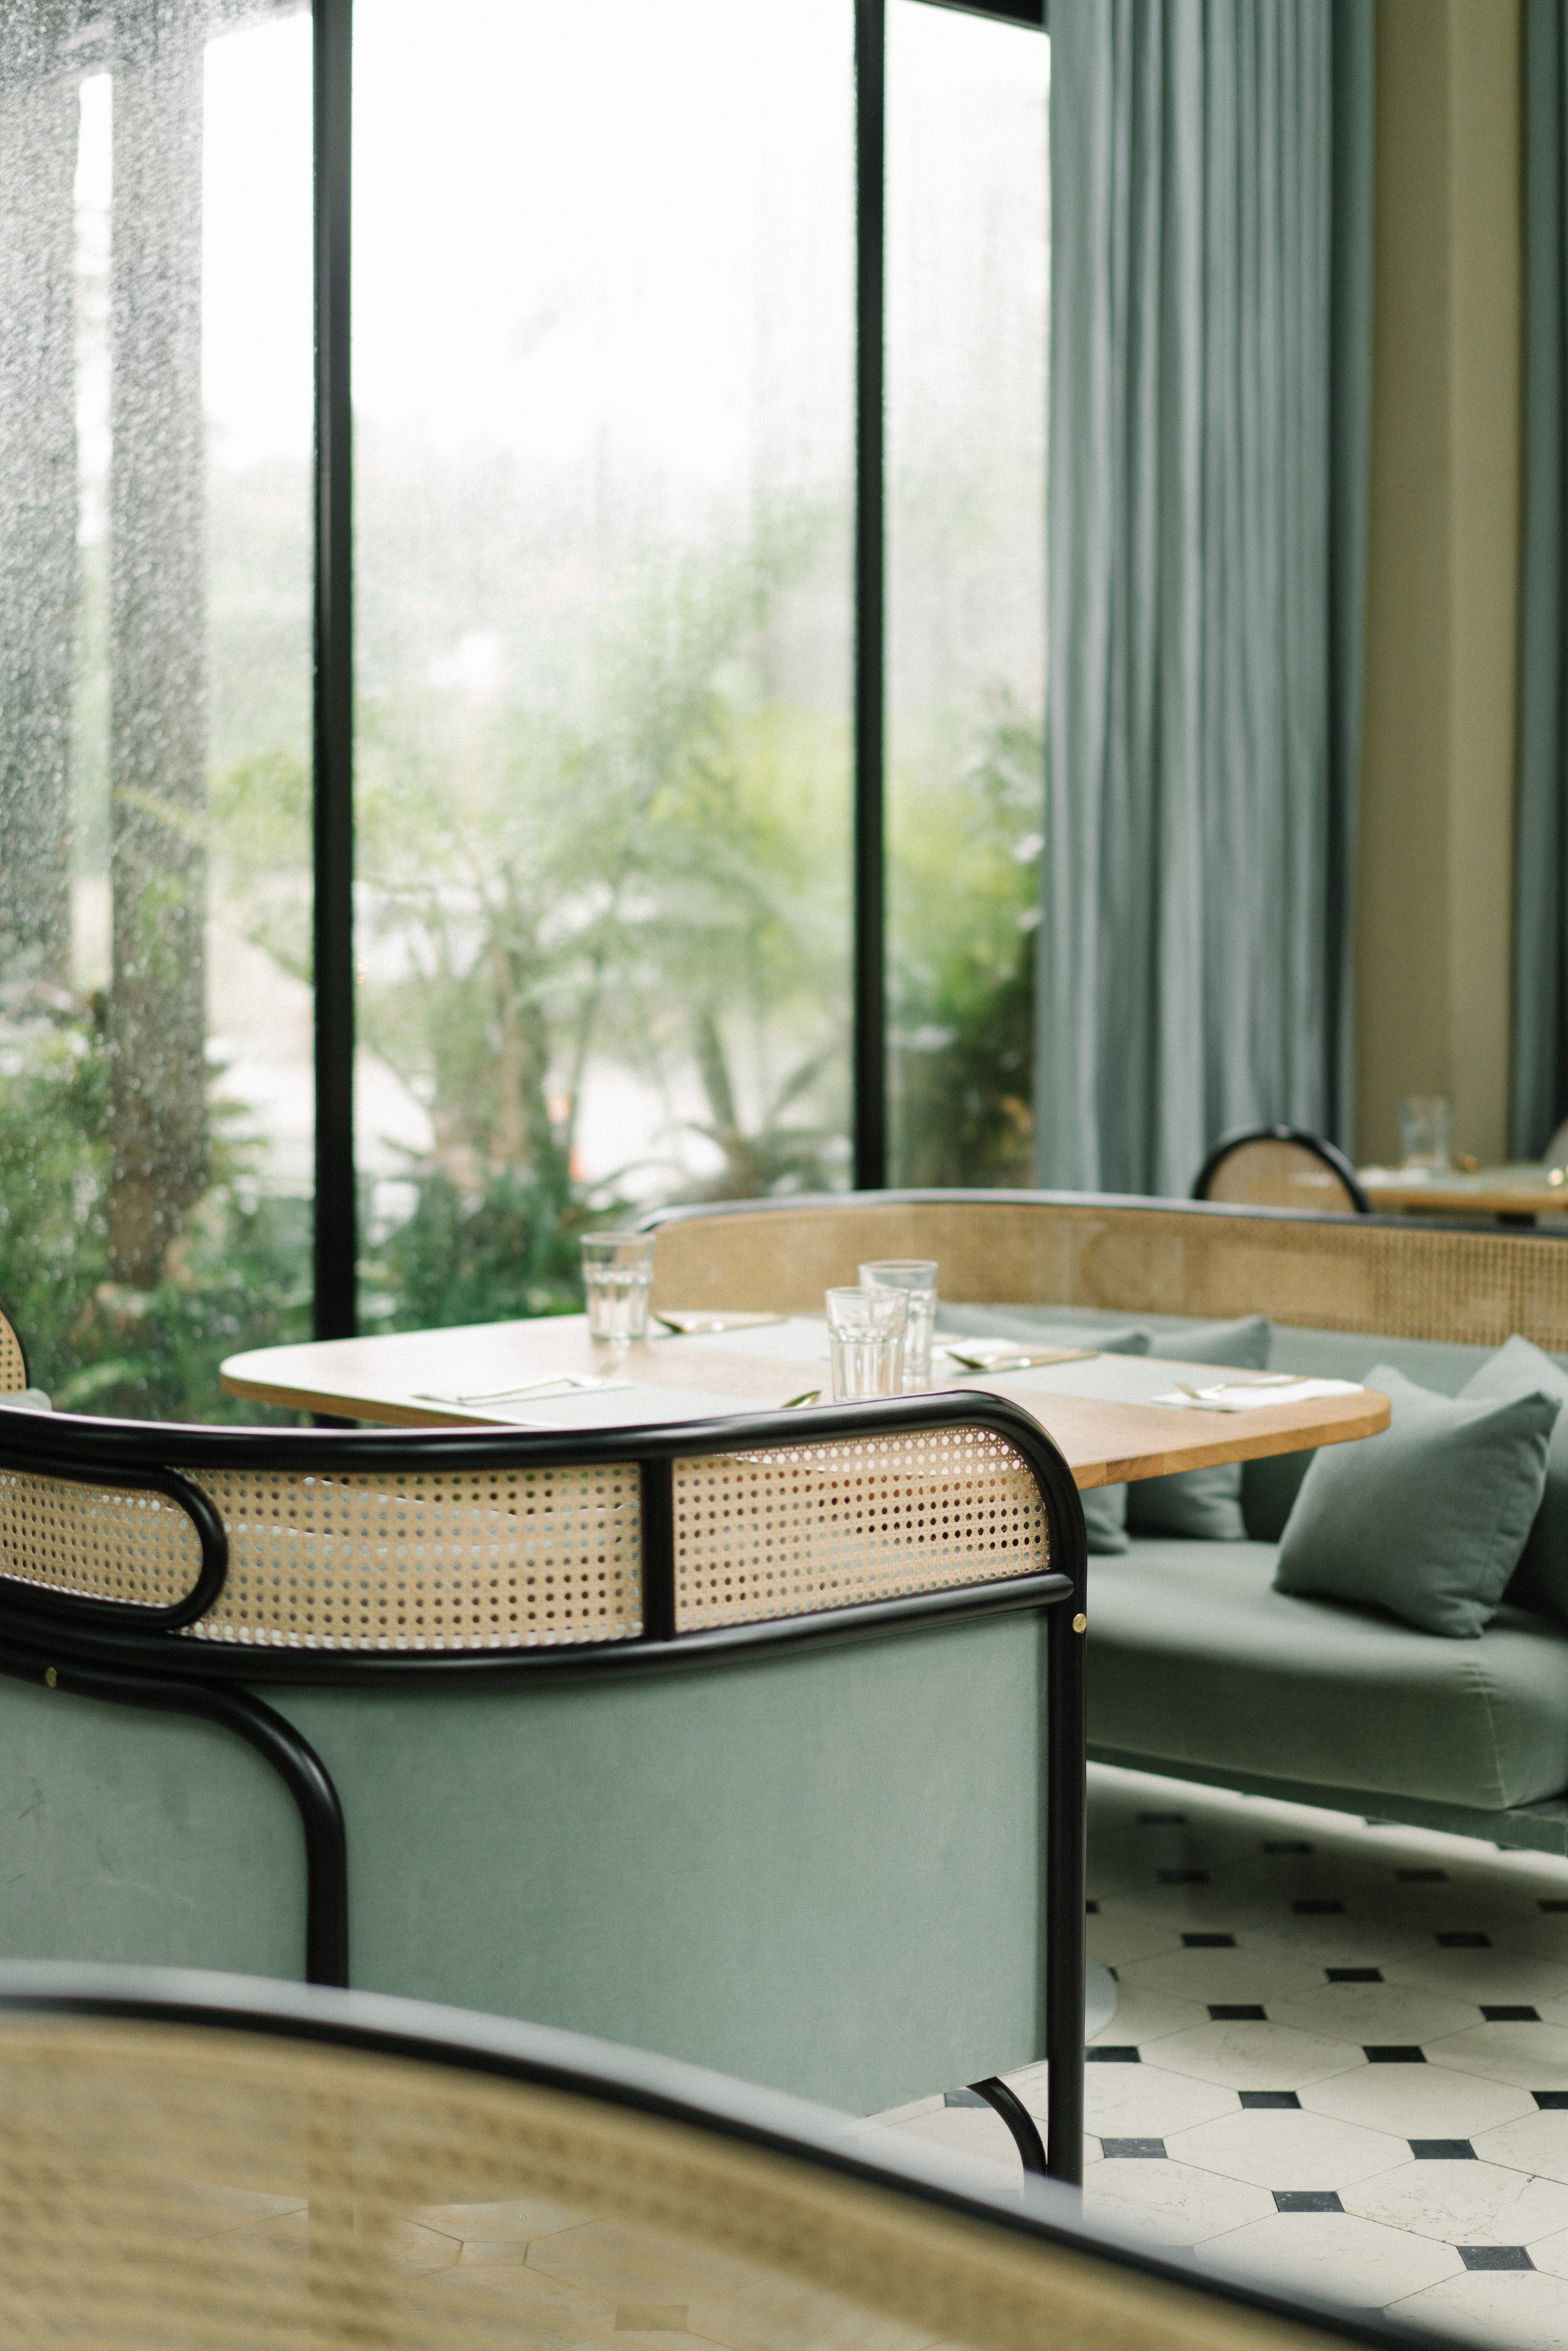 Interiors of the Harlan + Holden Glasshouse cafe designed by Gamfratesi